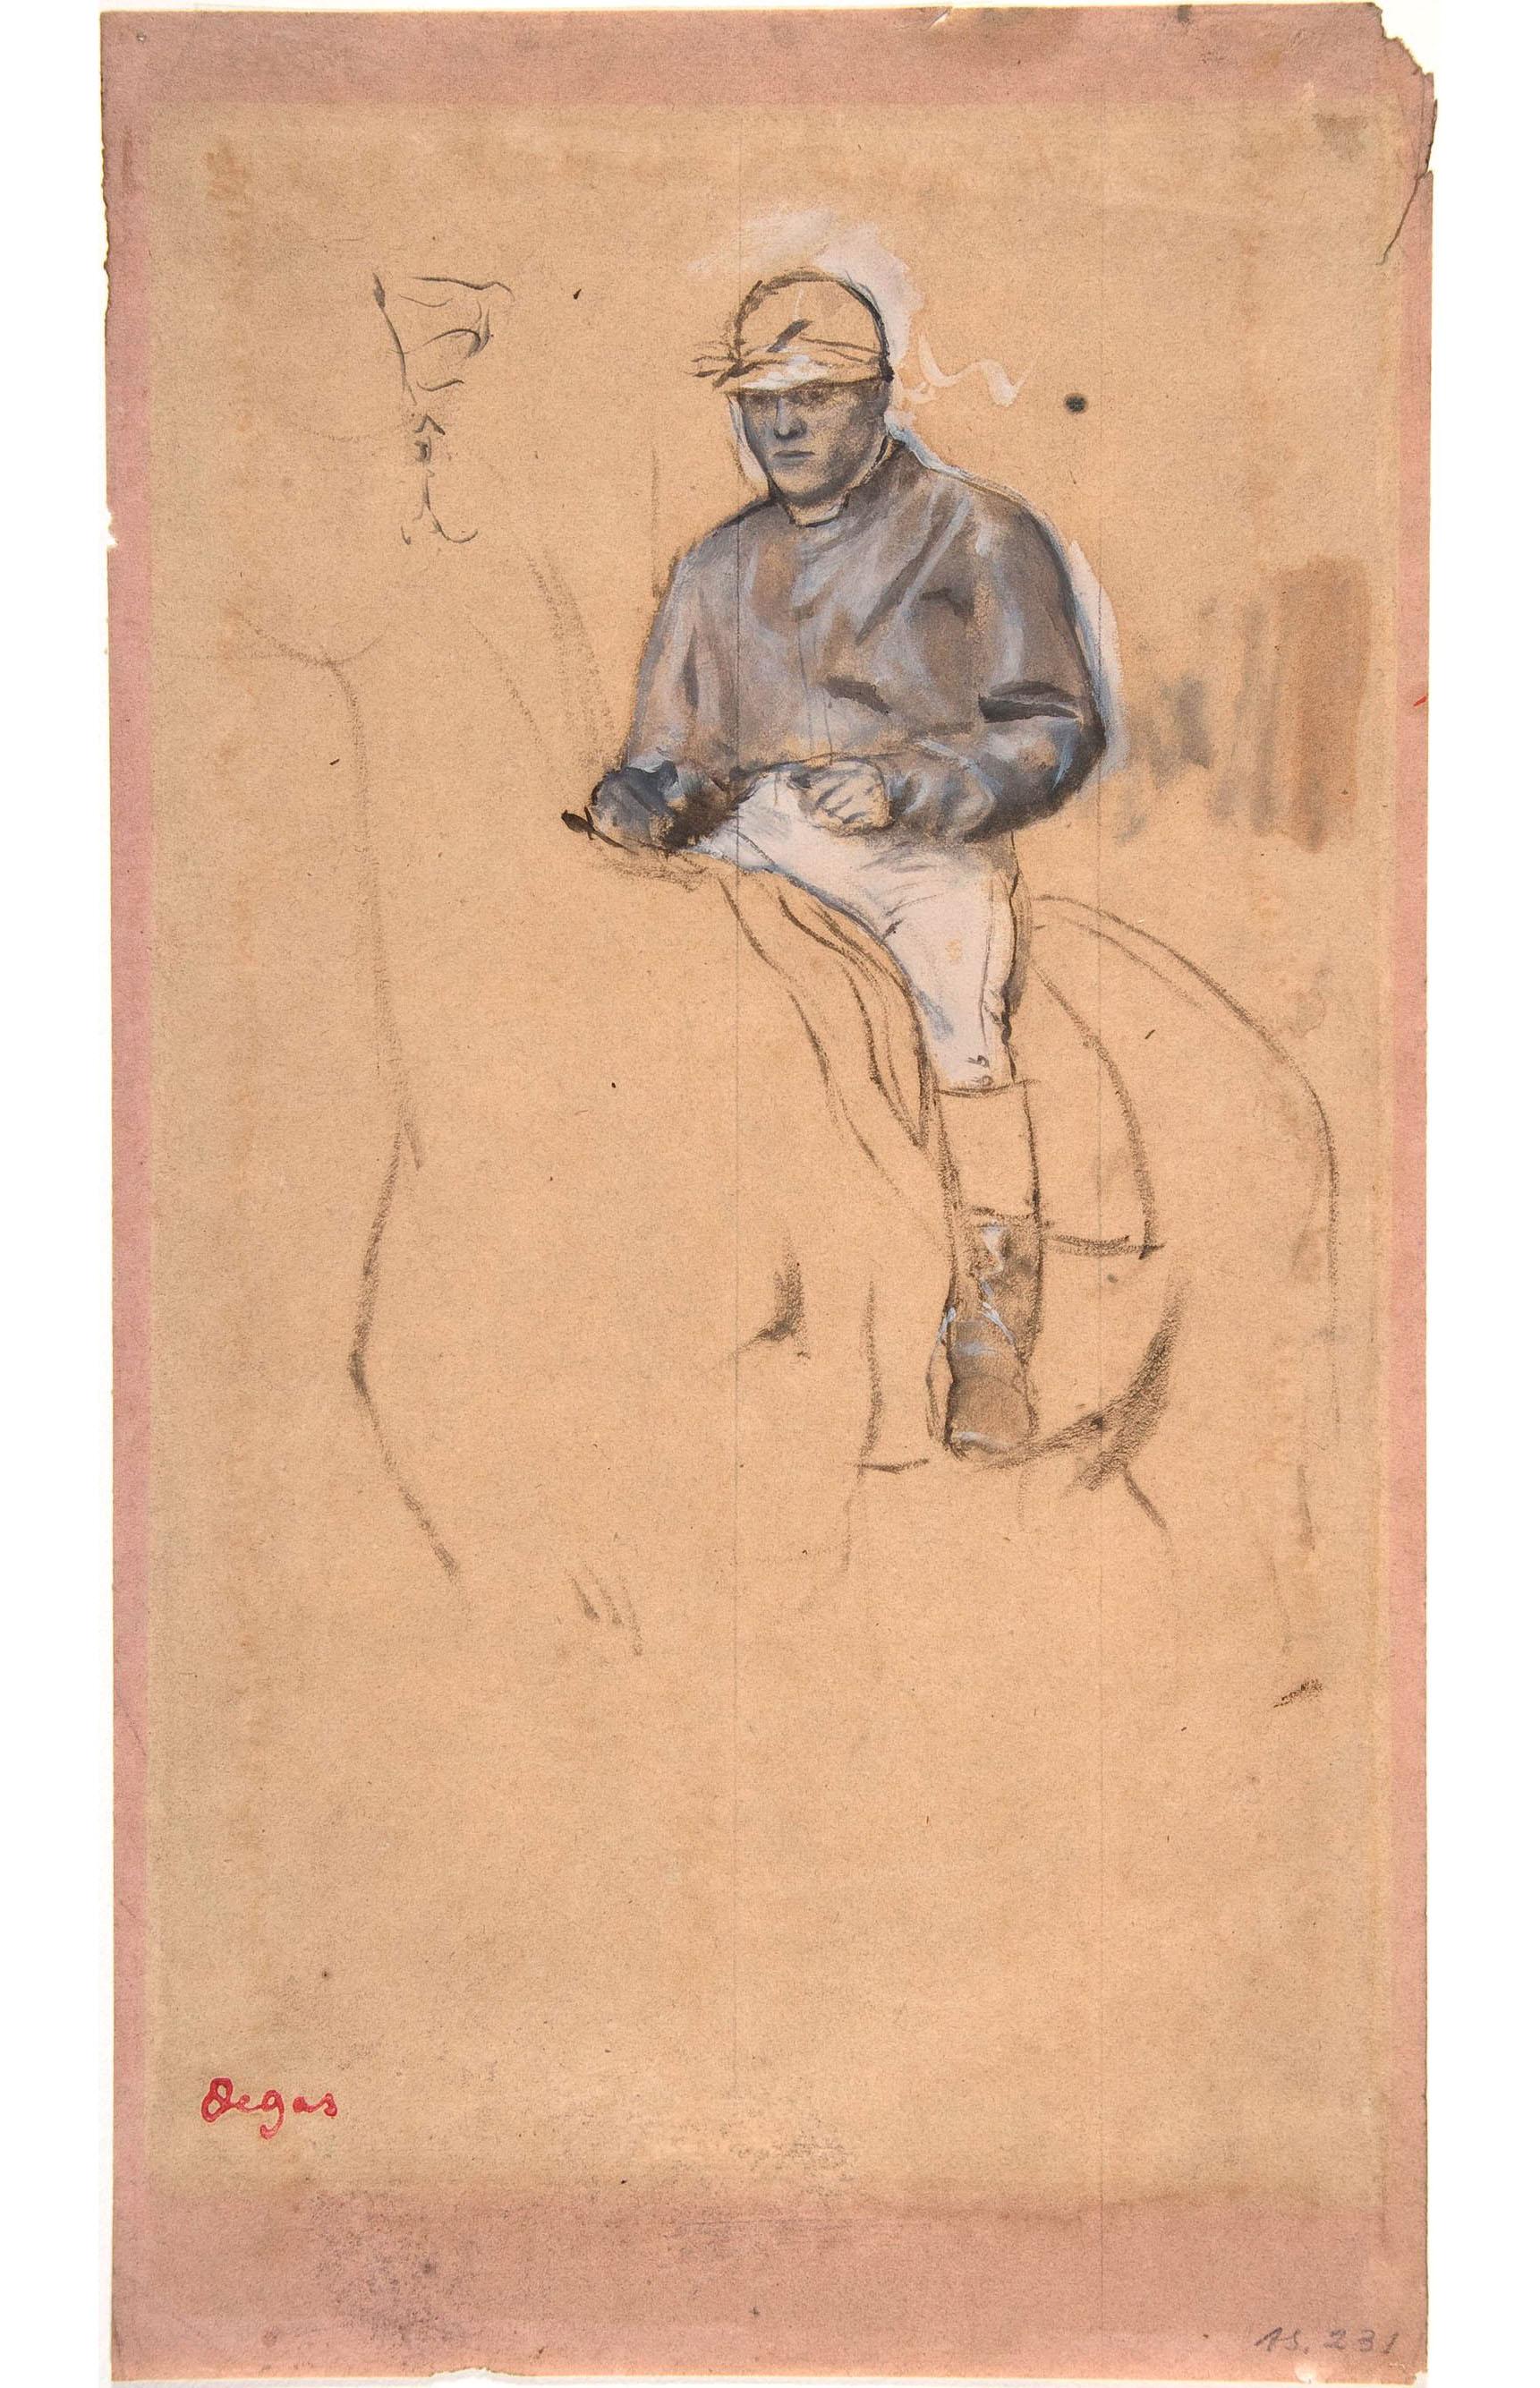 Эдгар Дега. Жокей на коне. 1850-1917.